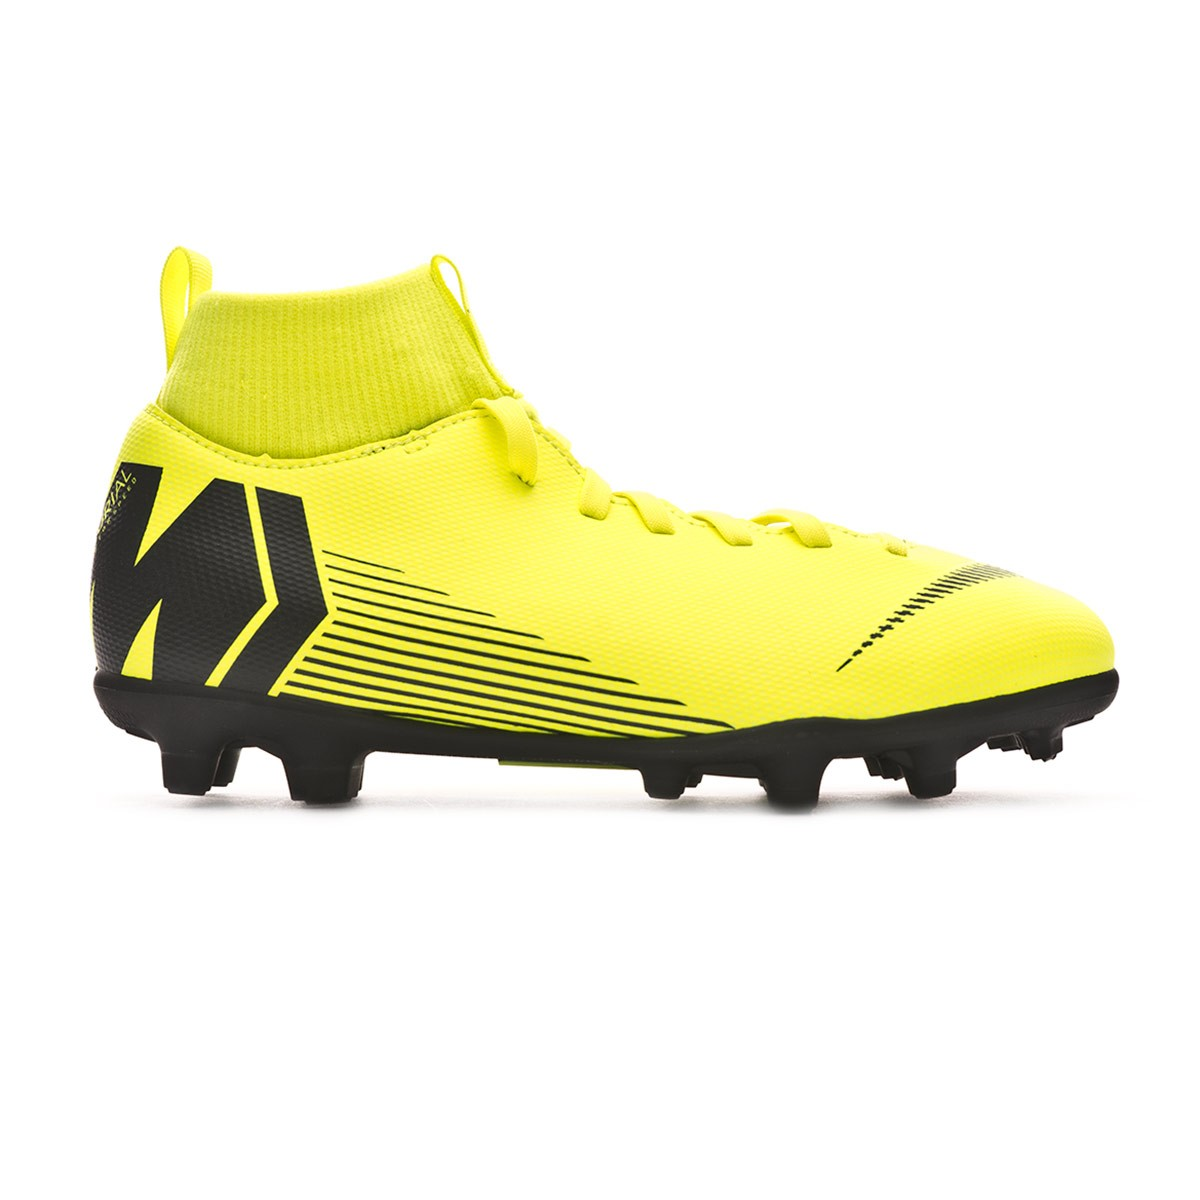 4f9ff949e26 Football Boots Nike Kids Mercurial Superfly VI Club MG Volt-Black - Tienda  de fútbol Fútbol Emotion